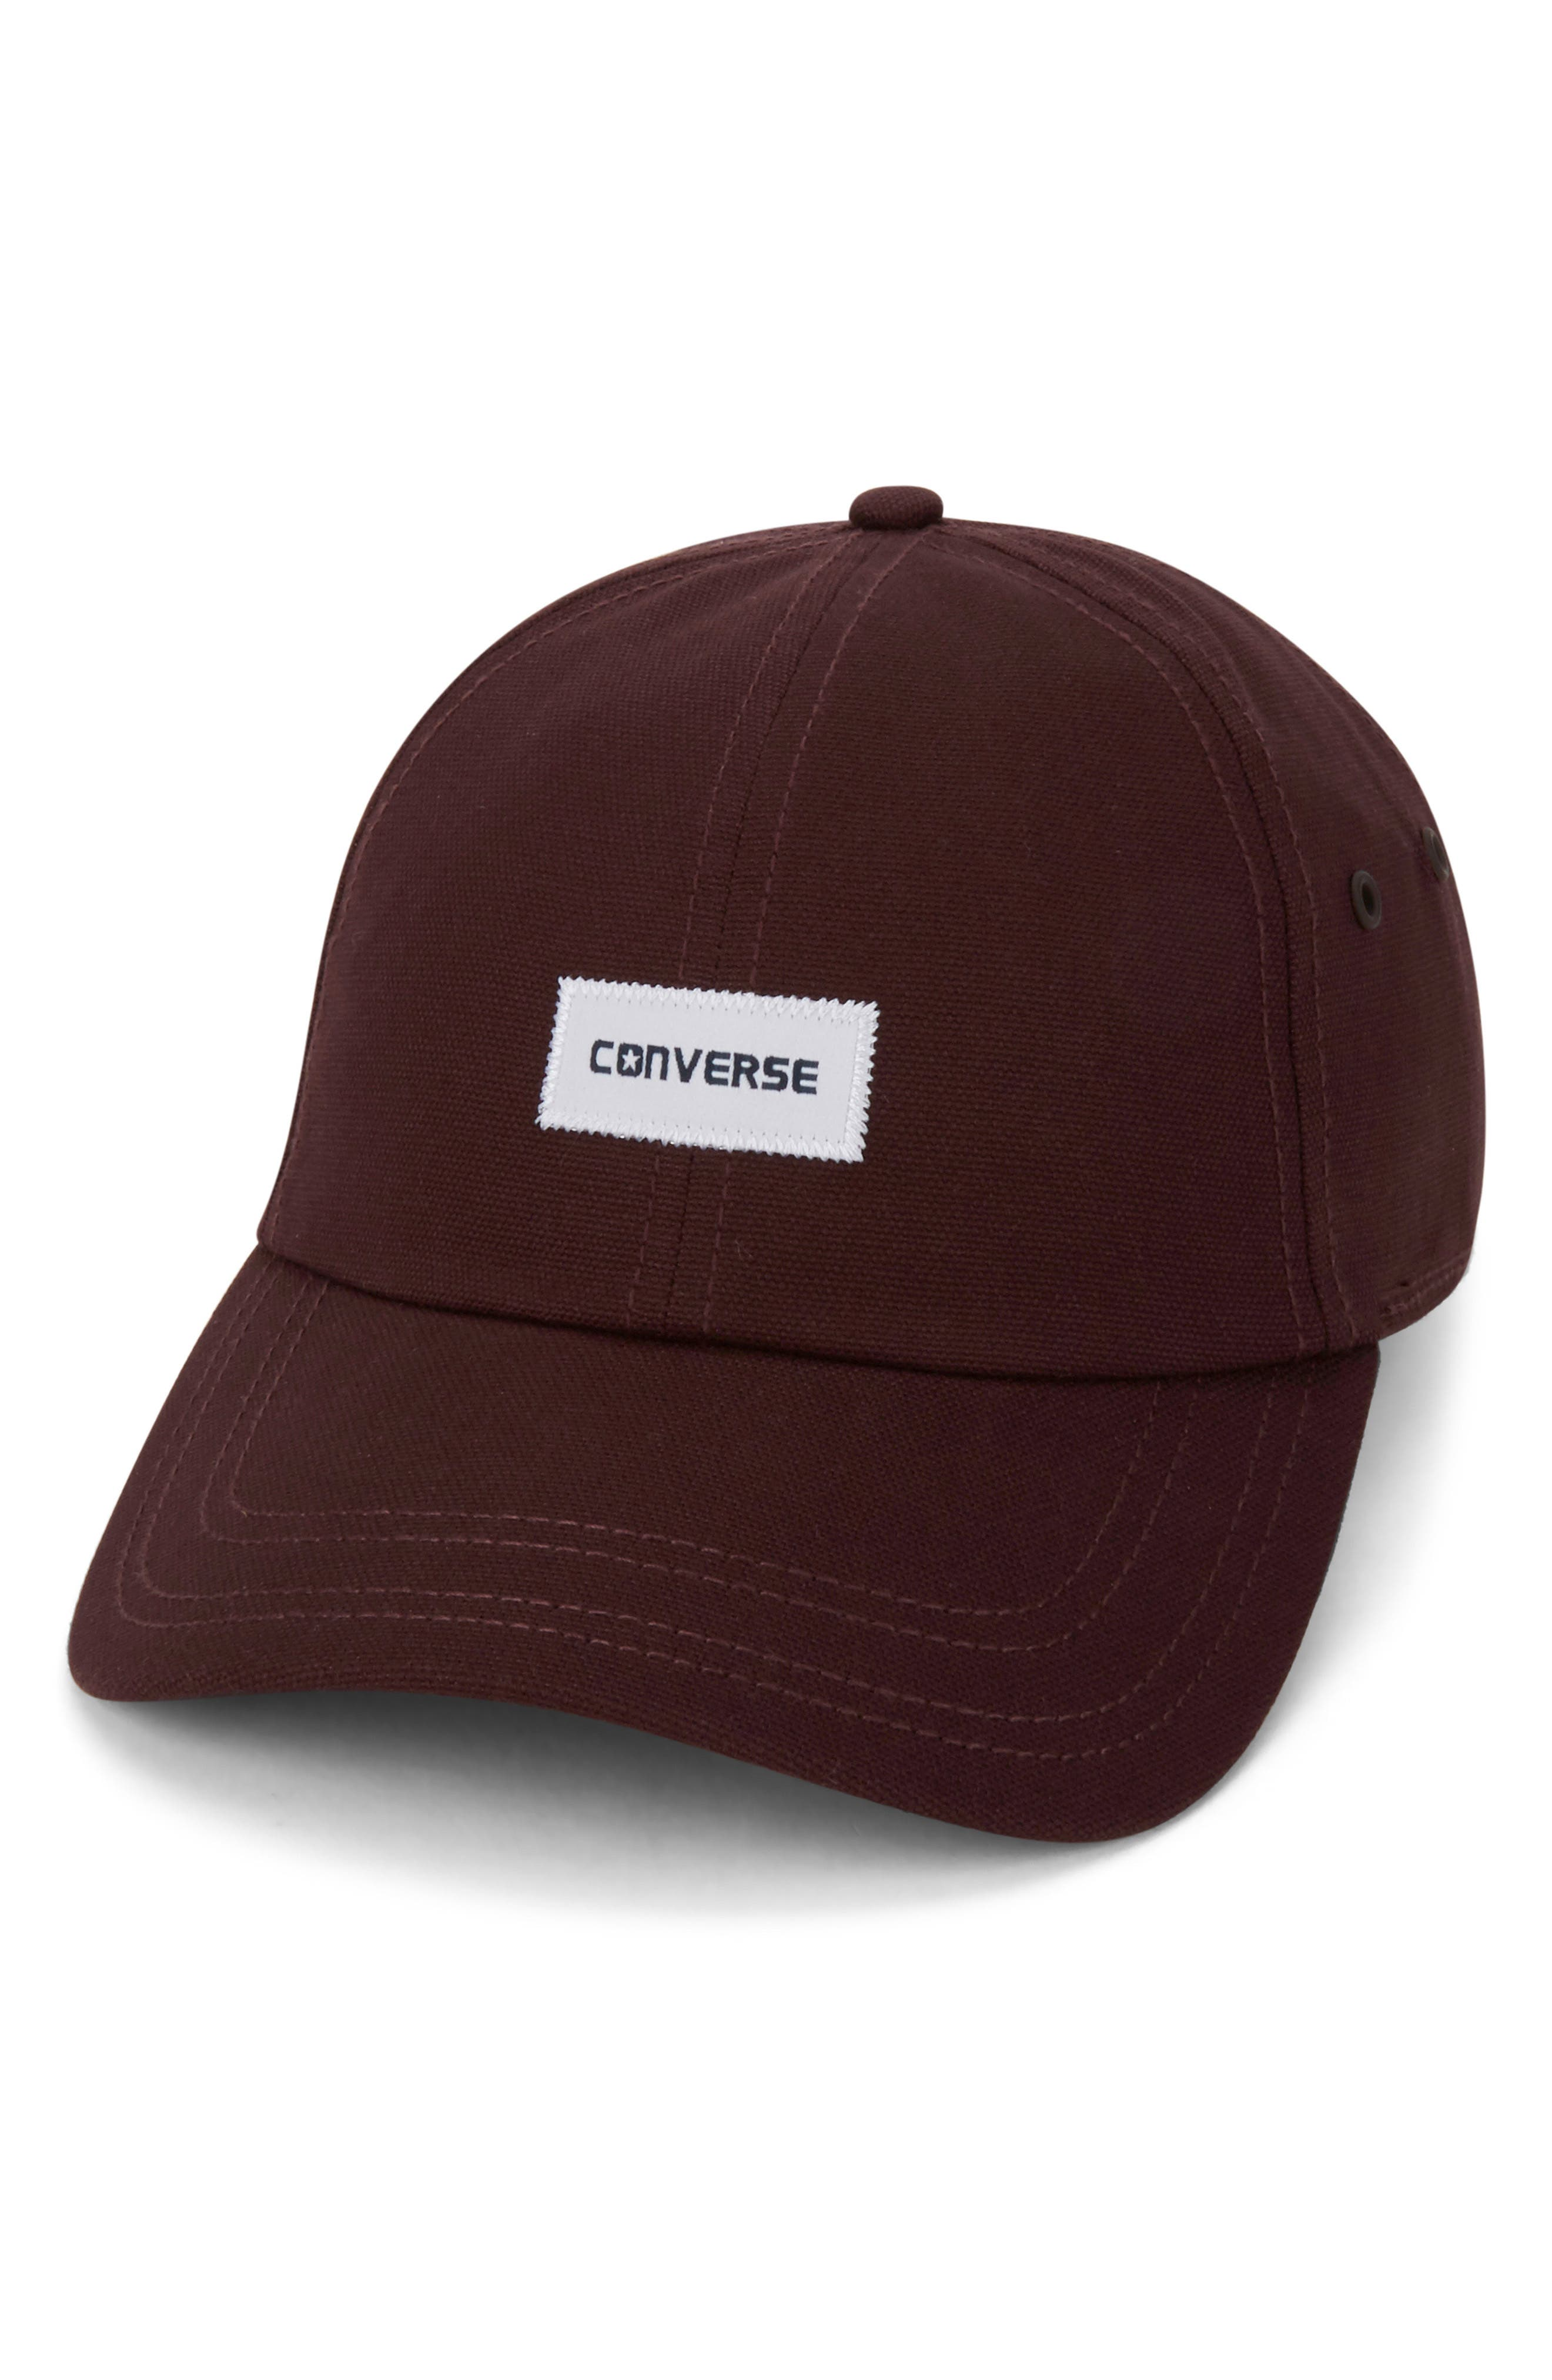 Converse Charles Baseball Cap